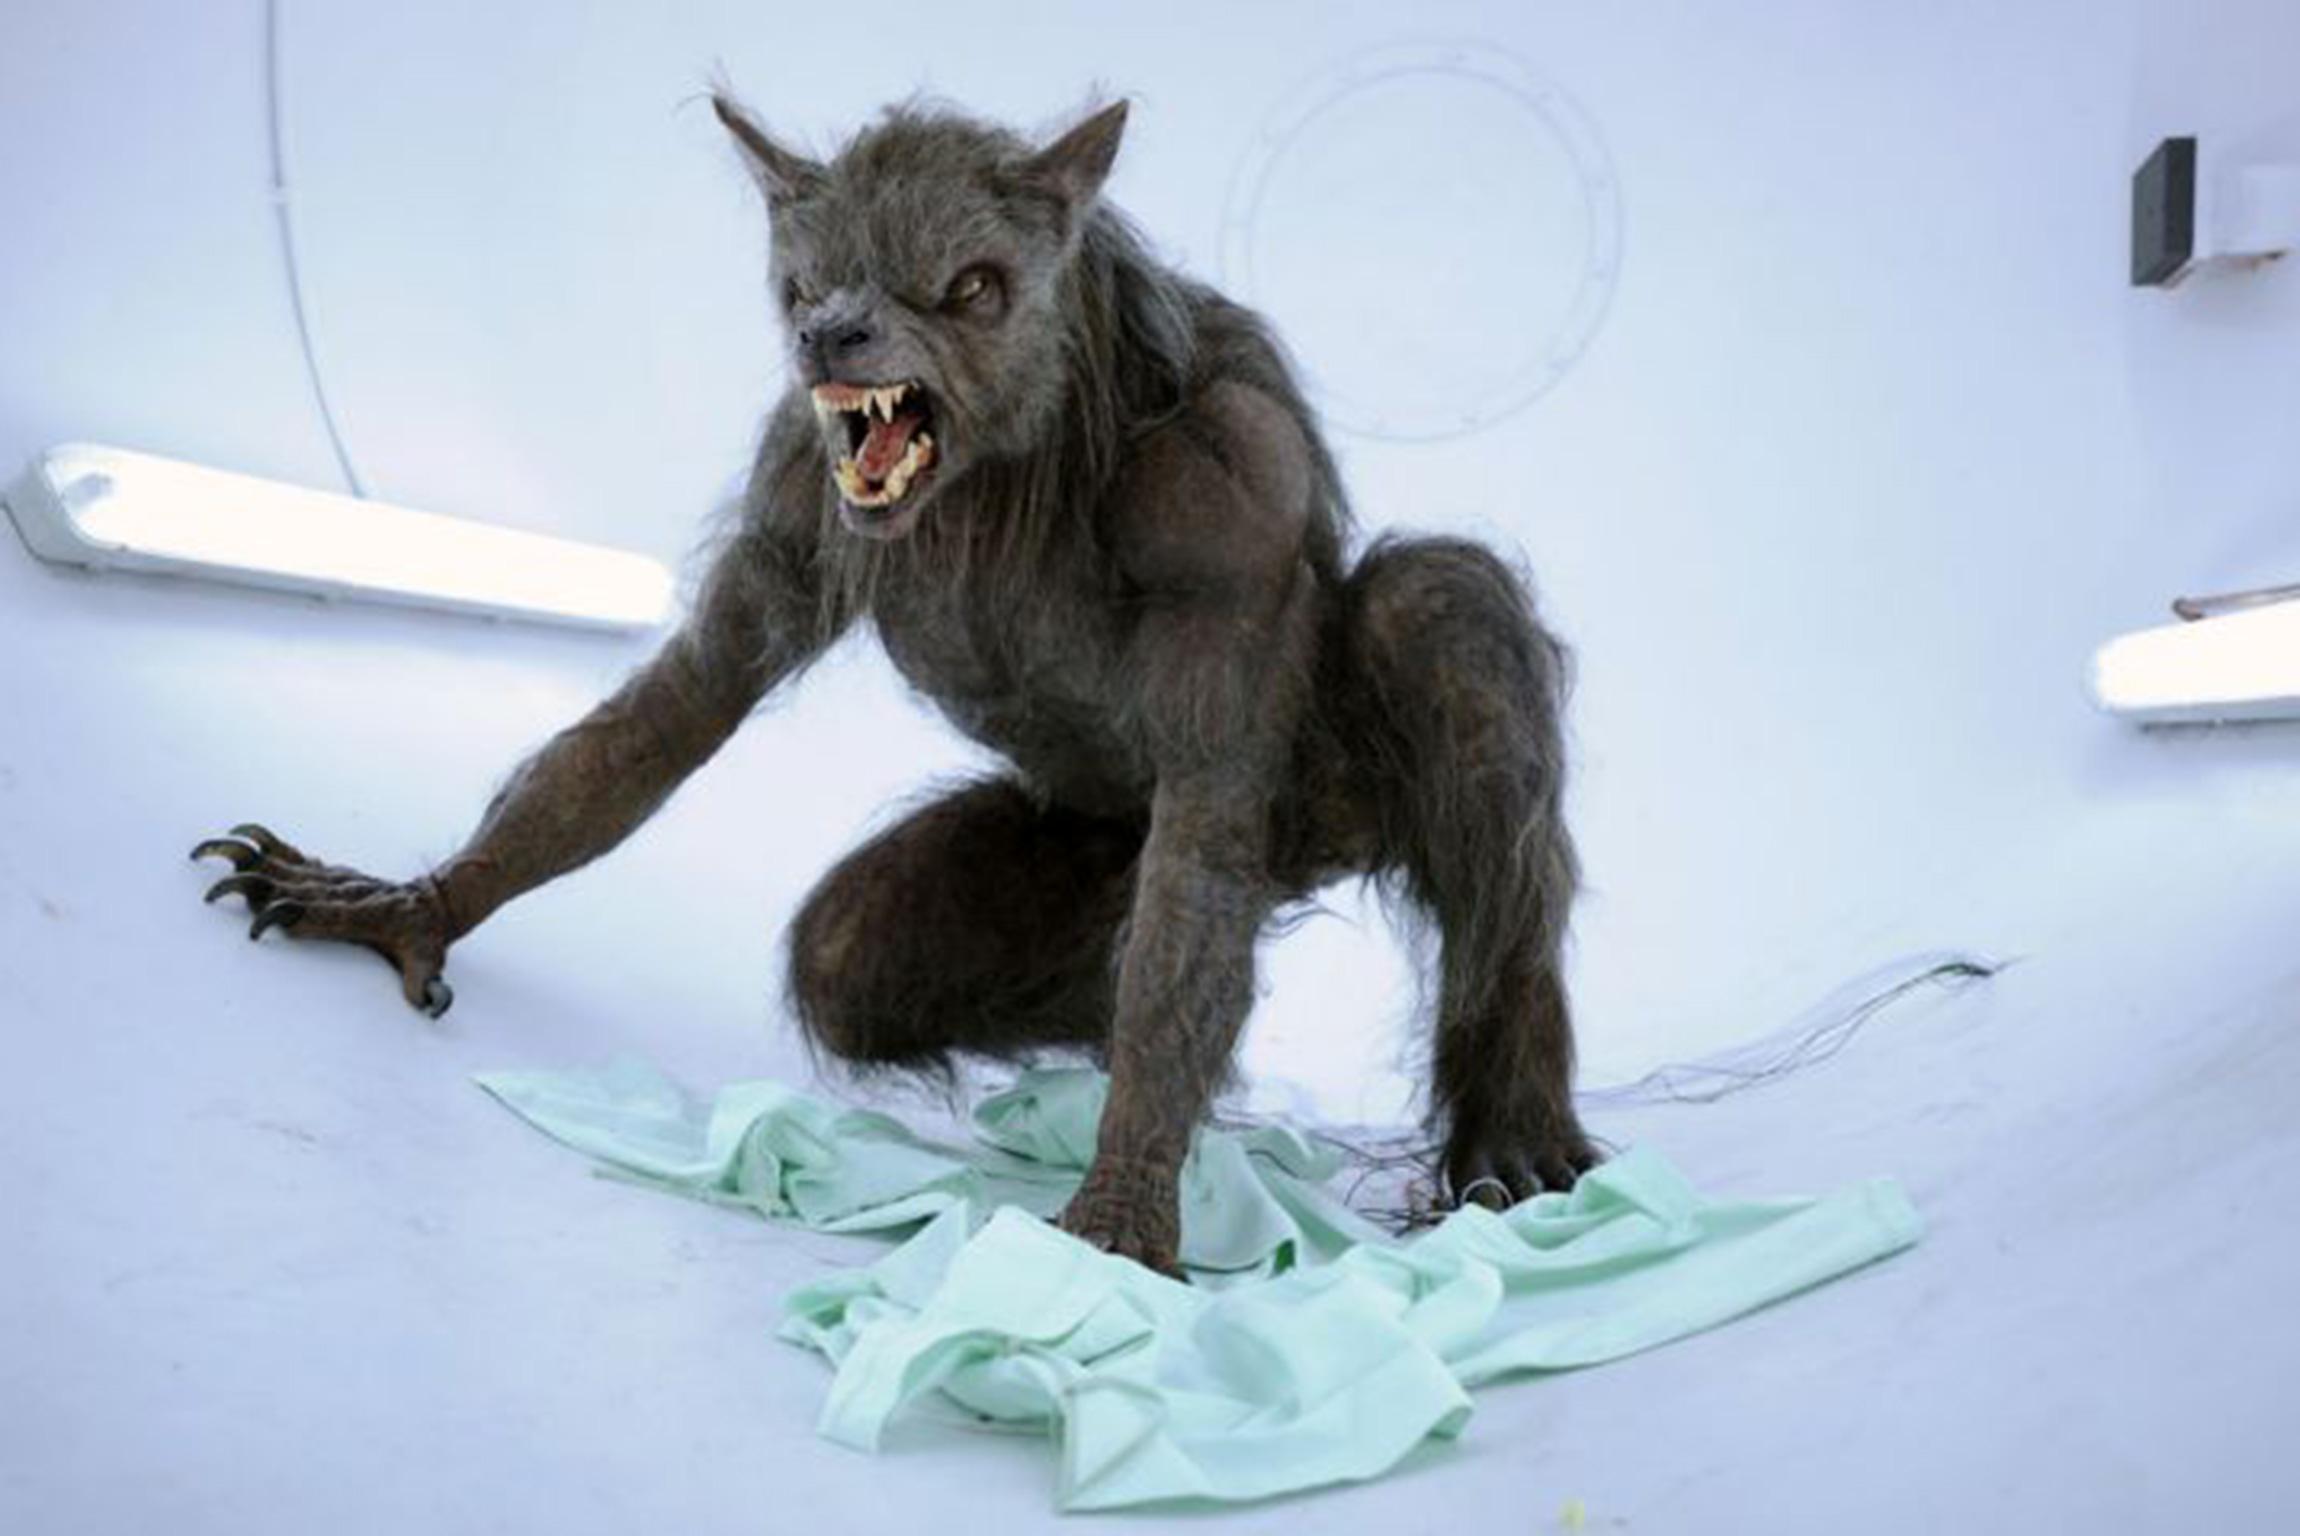 Drawn wolfman irish A see Werewolf conference